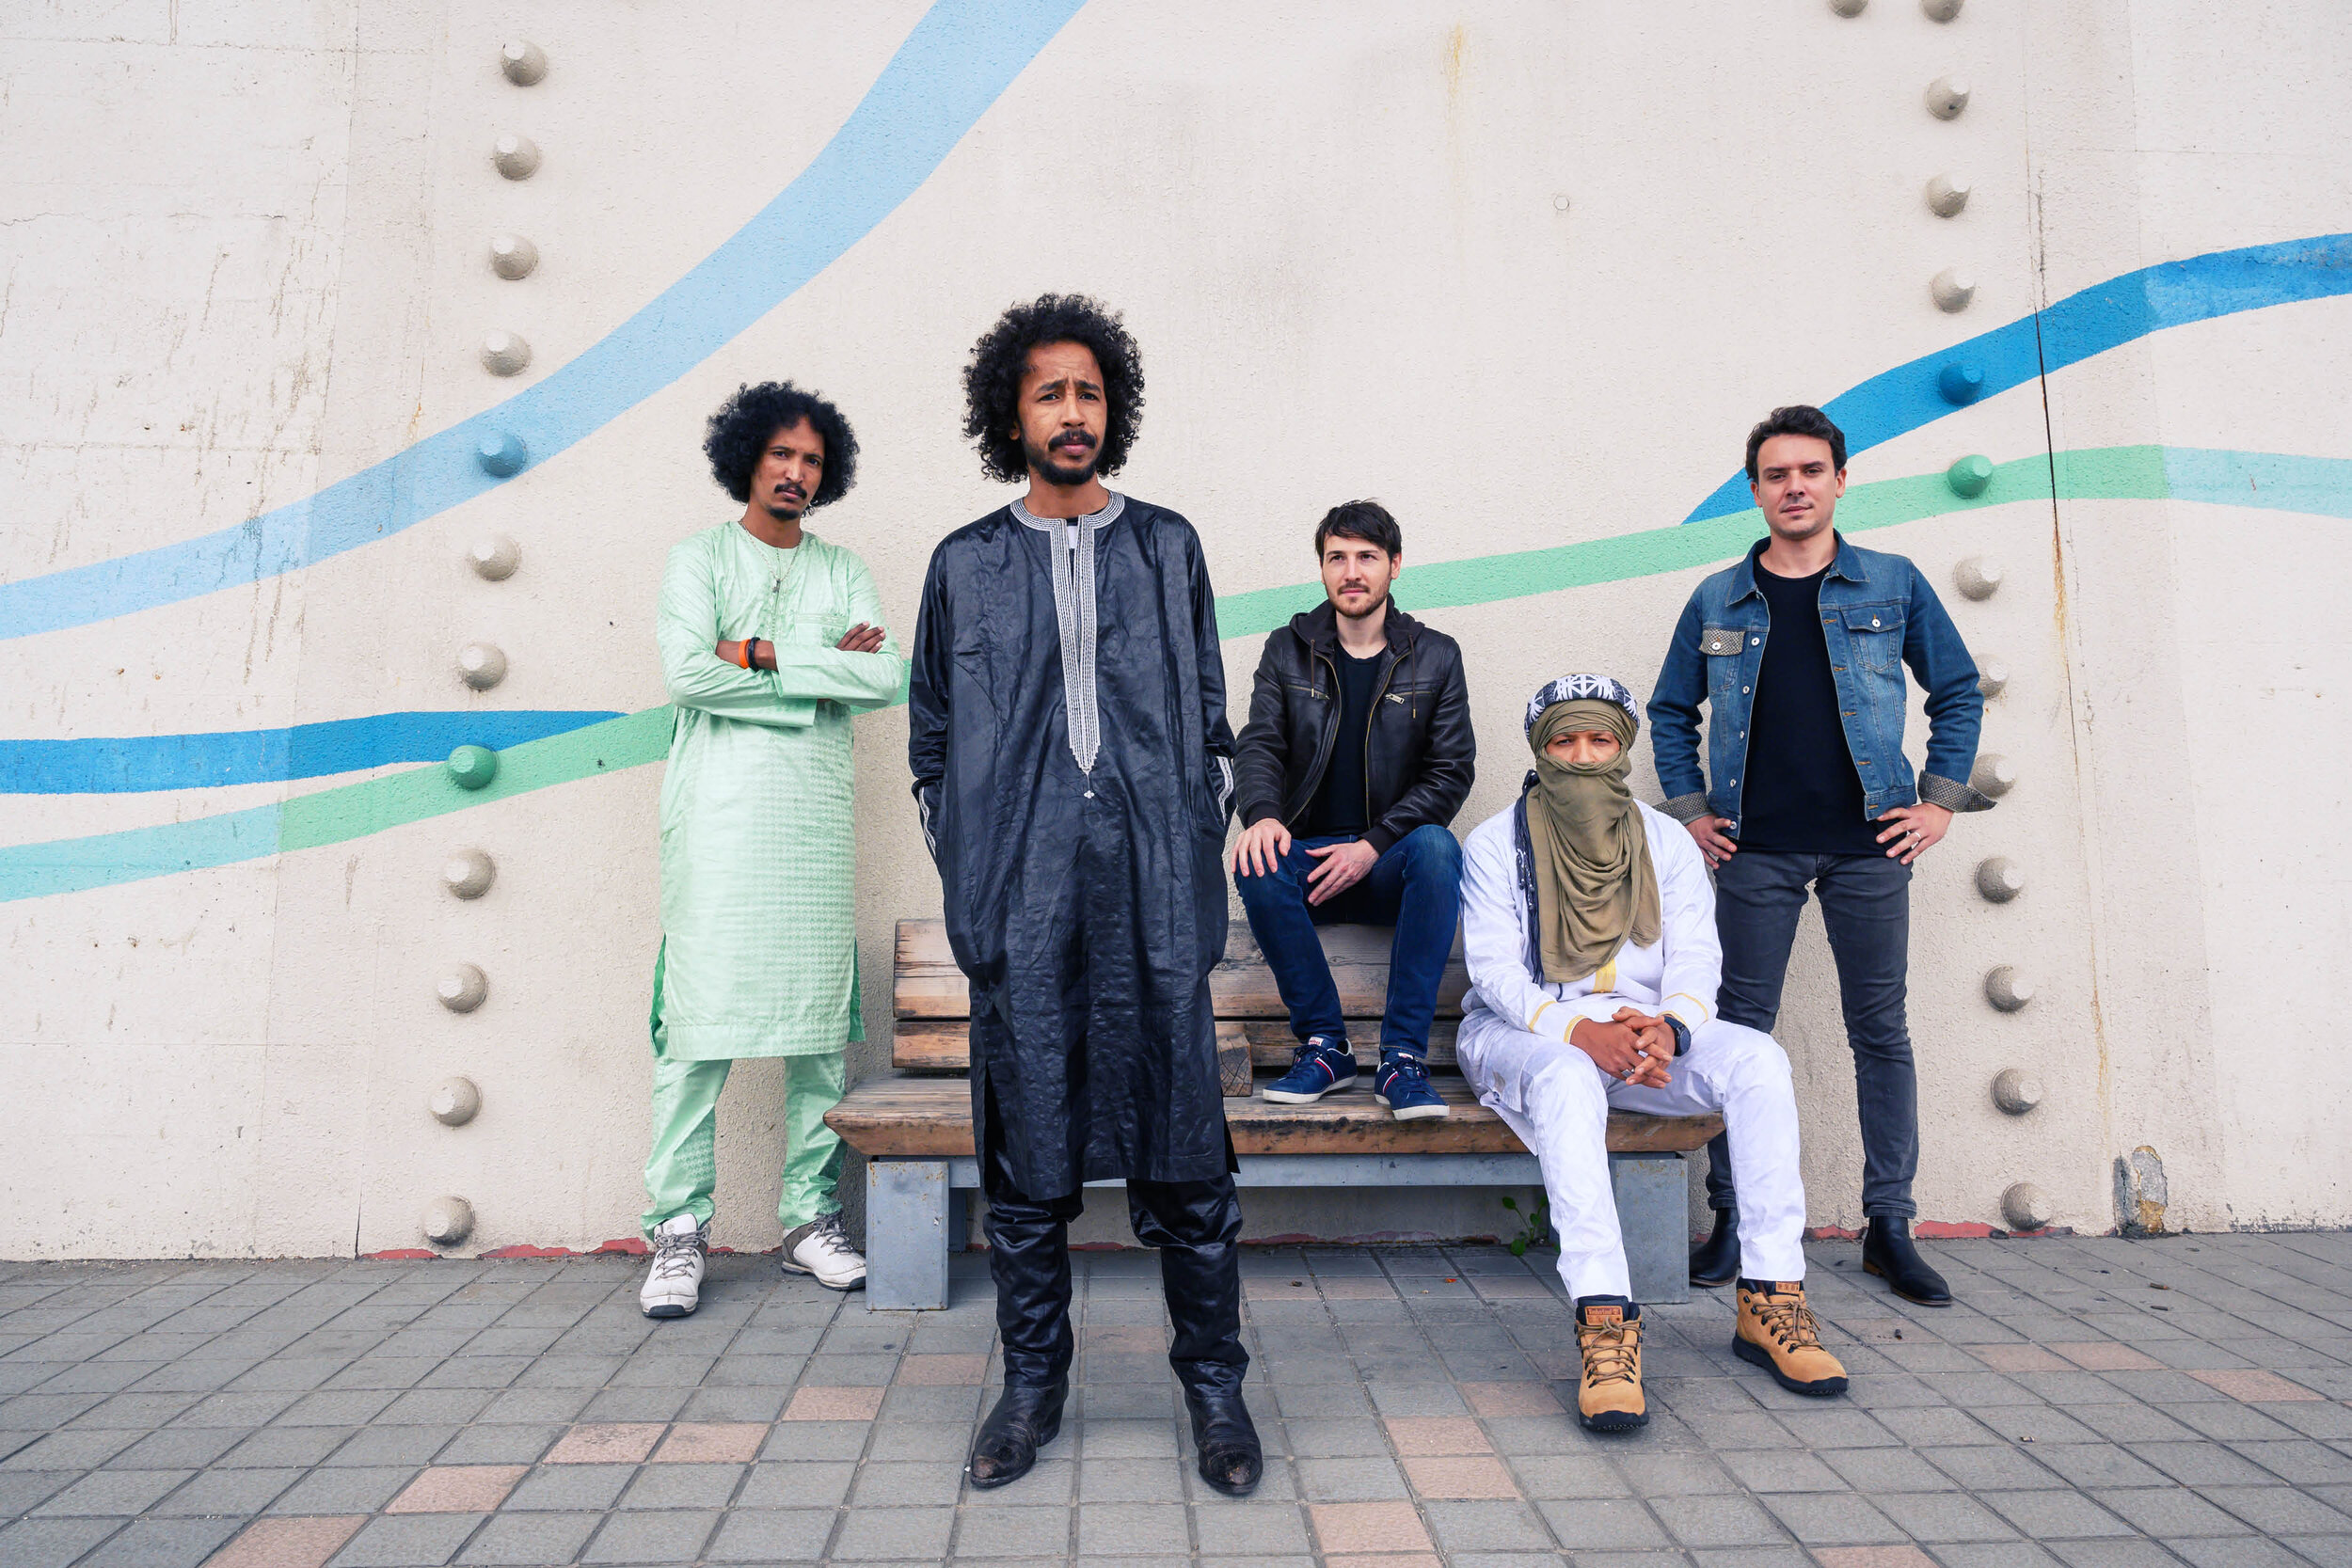 Det turkise telt en ambitiøs musikfestival i Aarhus Festuge